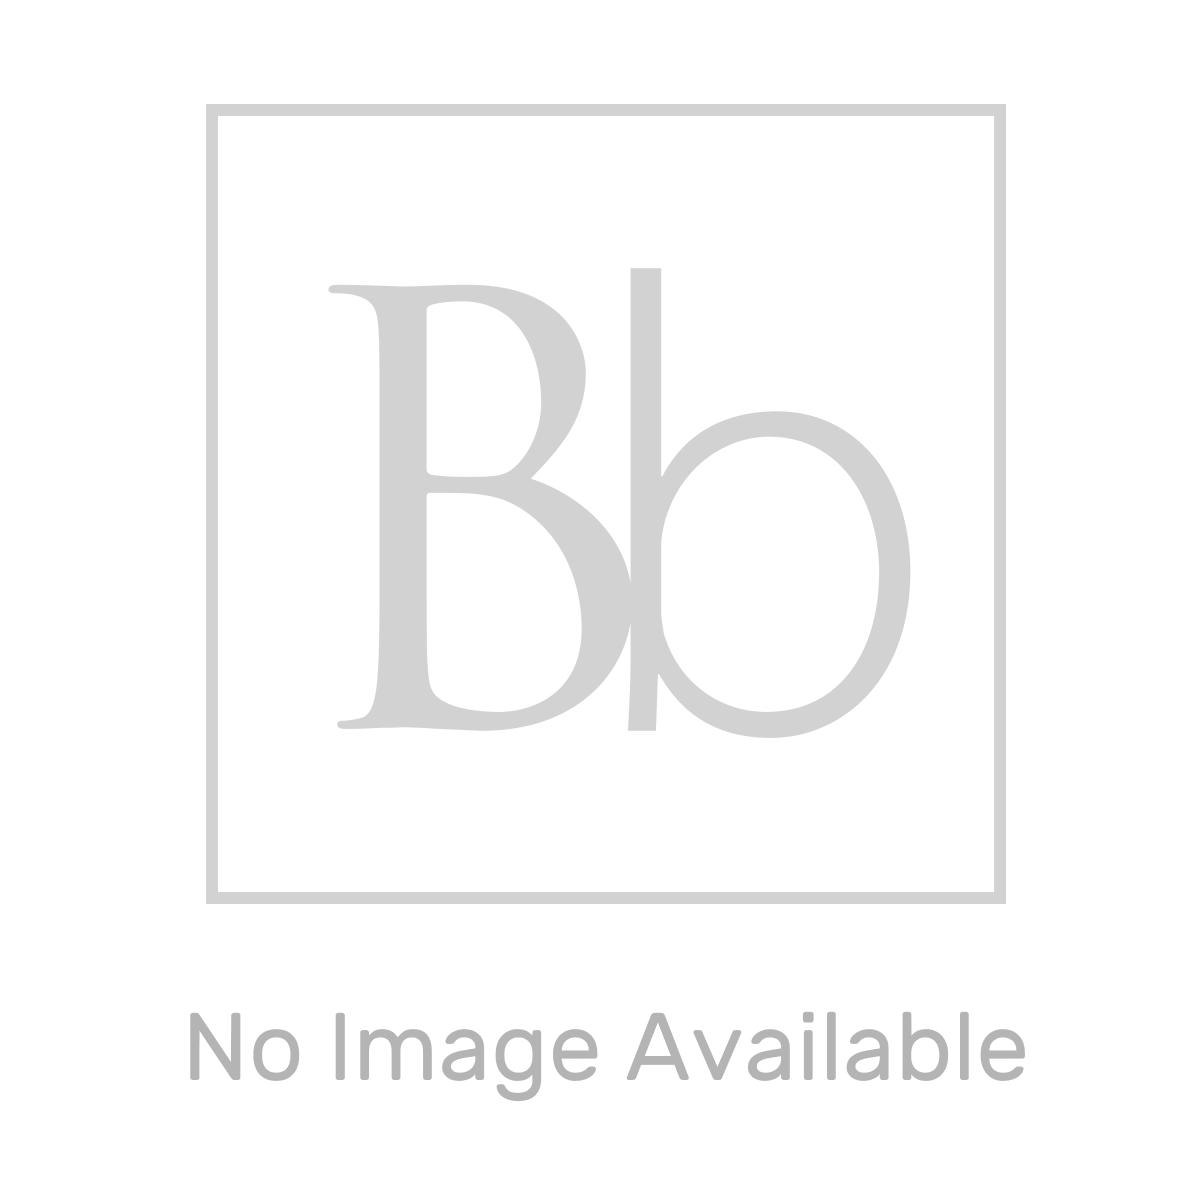 RAK Luce Translucent Marble White Full Lappato Tile 1200 x 2600mm Lifestyle